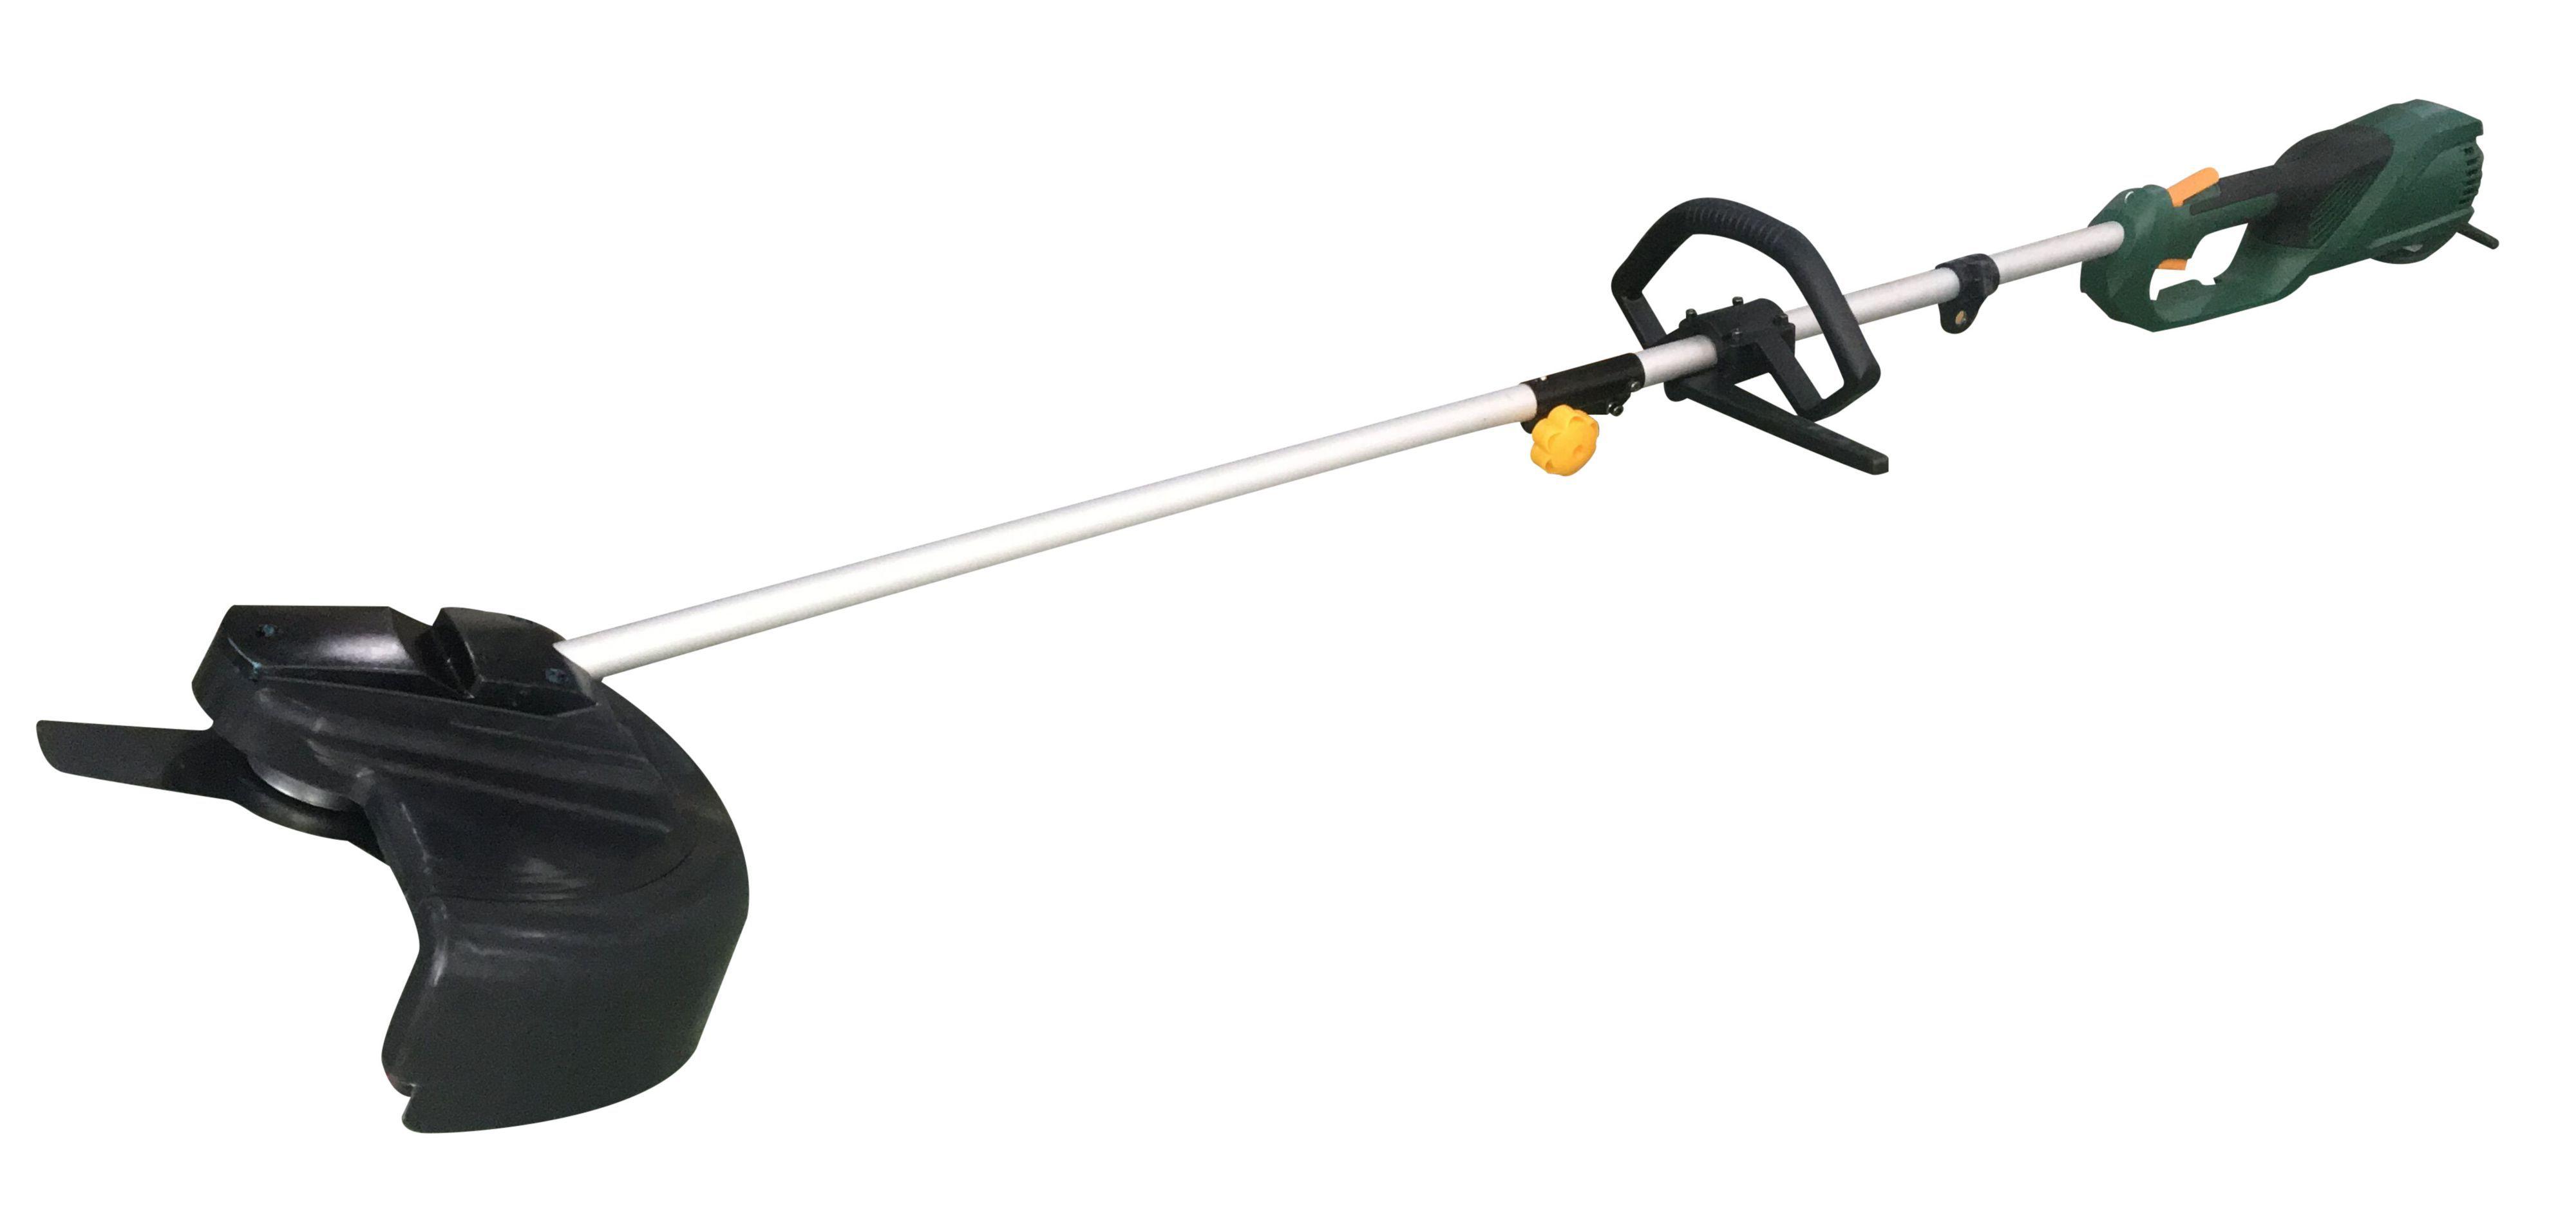 B&q Fpbc1000 Electric Corded Brush Cutter